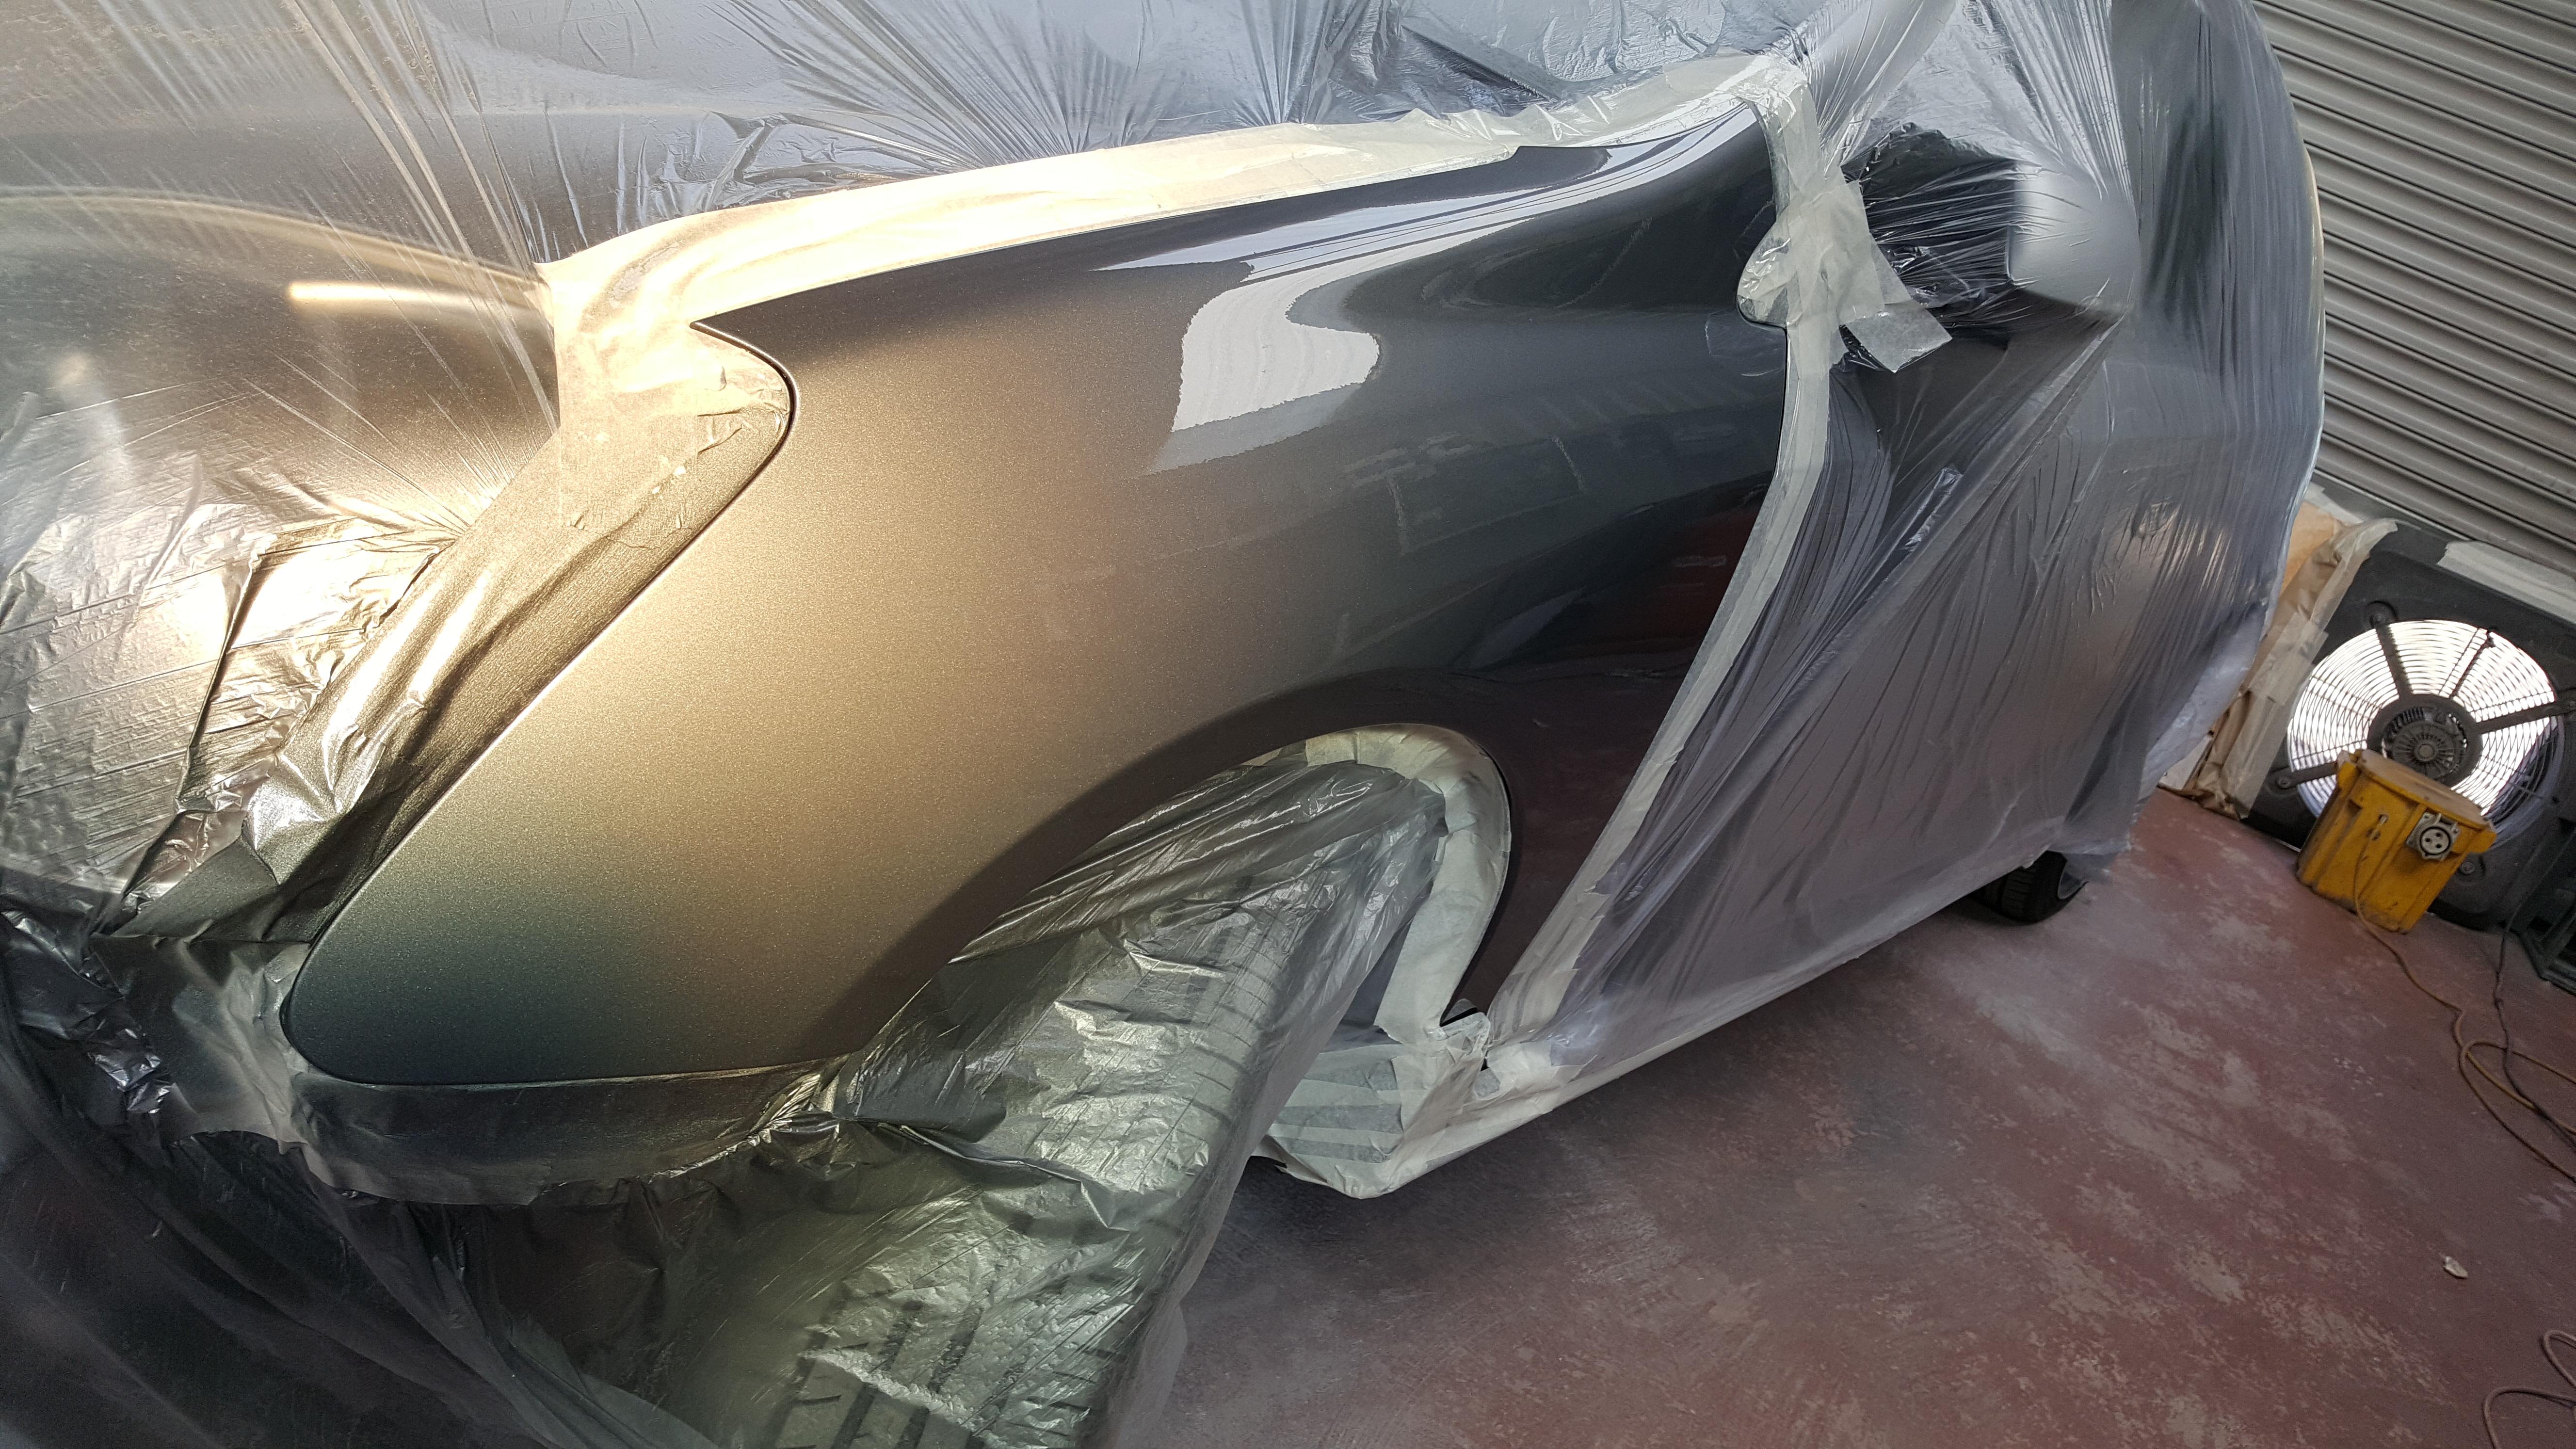 Fibre Glass Repairs - Reece's Car Body Paint Repair Shop